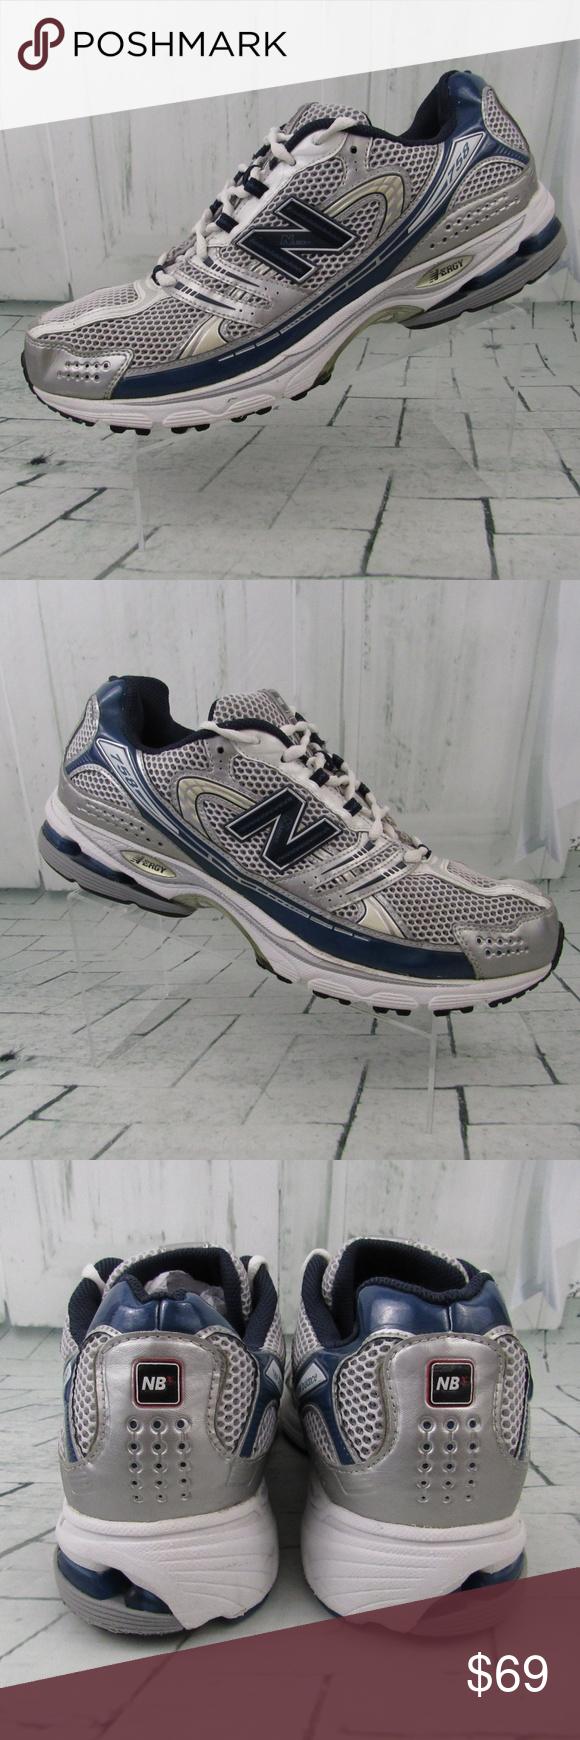 New Balance 758 MR758CU Running Shoe Size 14 | Running shoes, New ...